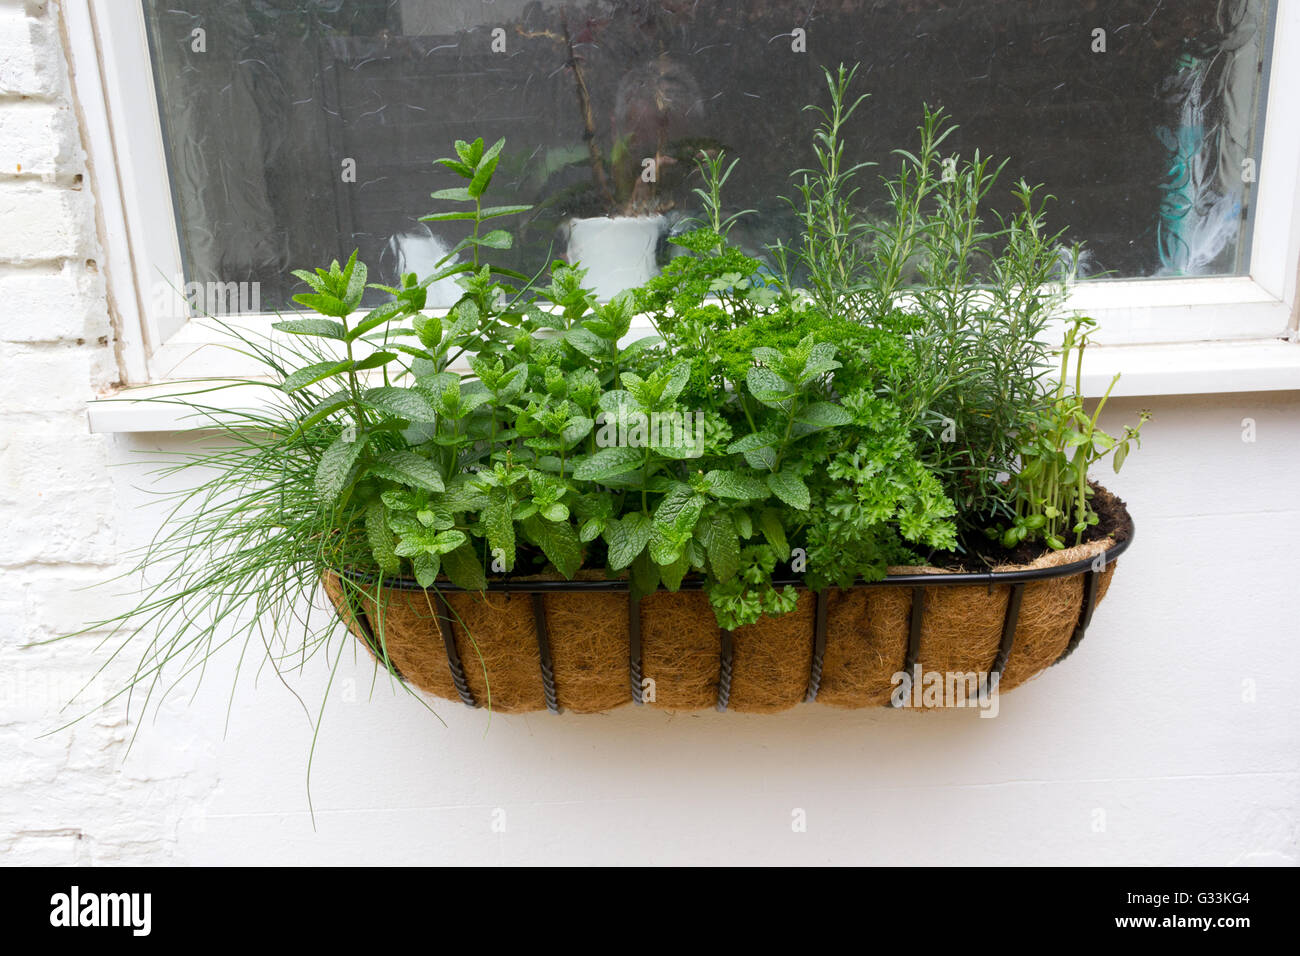 Window herb box - Stock Image